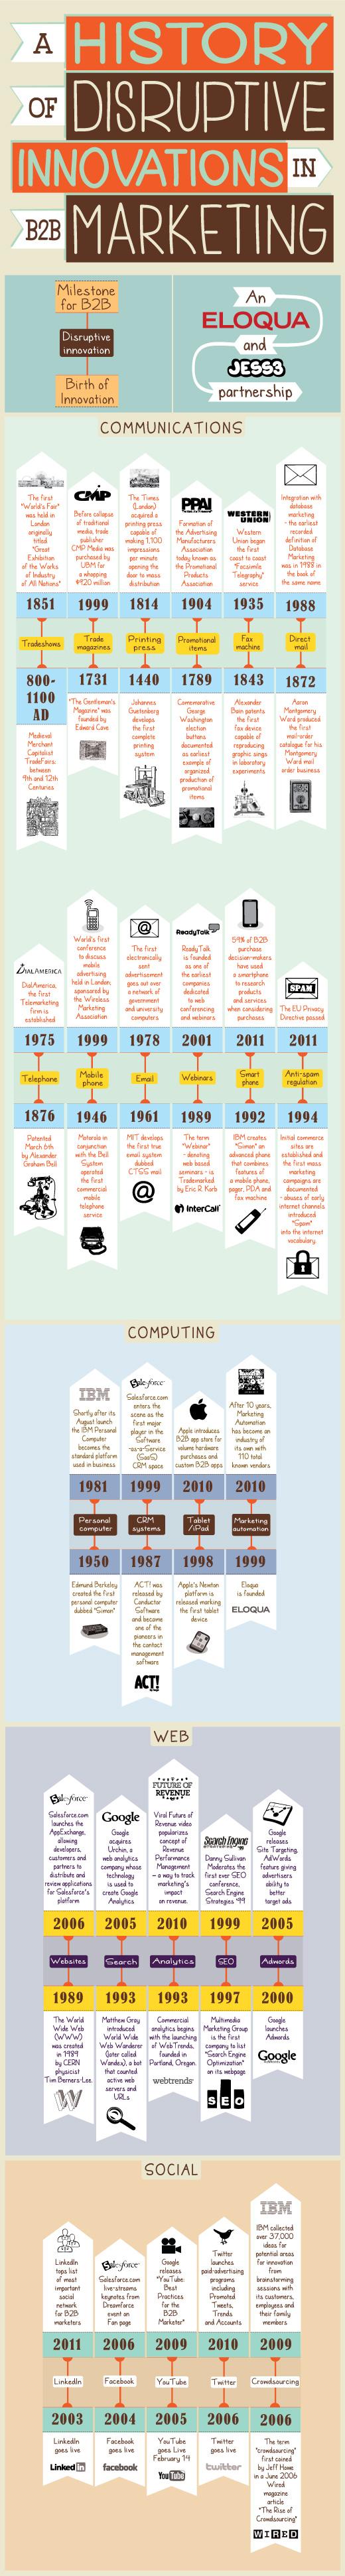 History of Disruptions in B2B Marketing resized 600